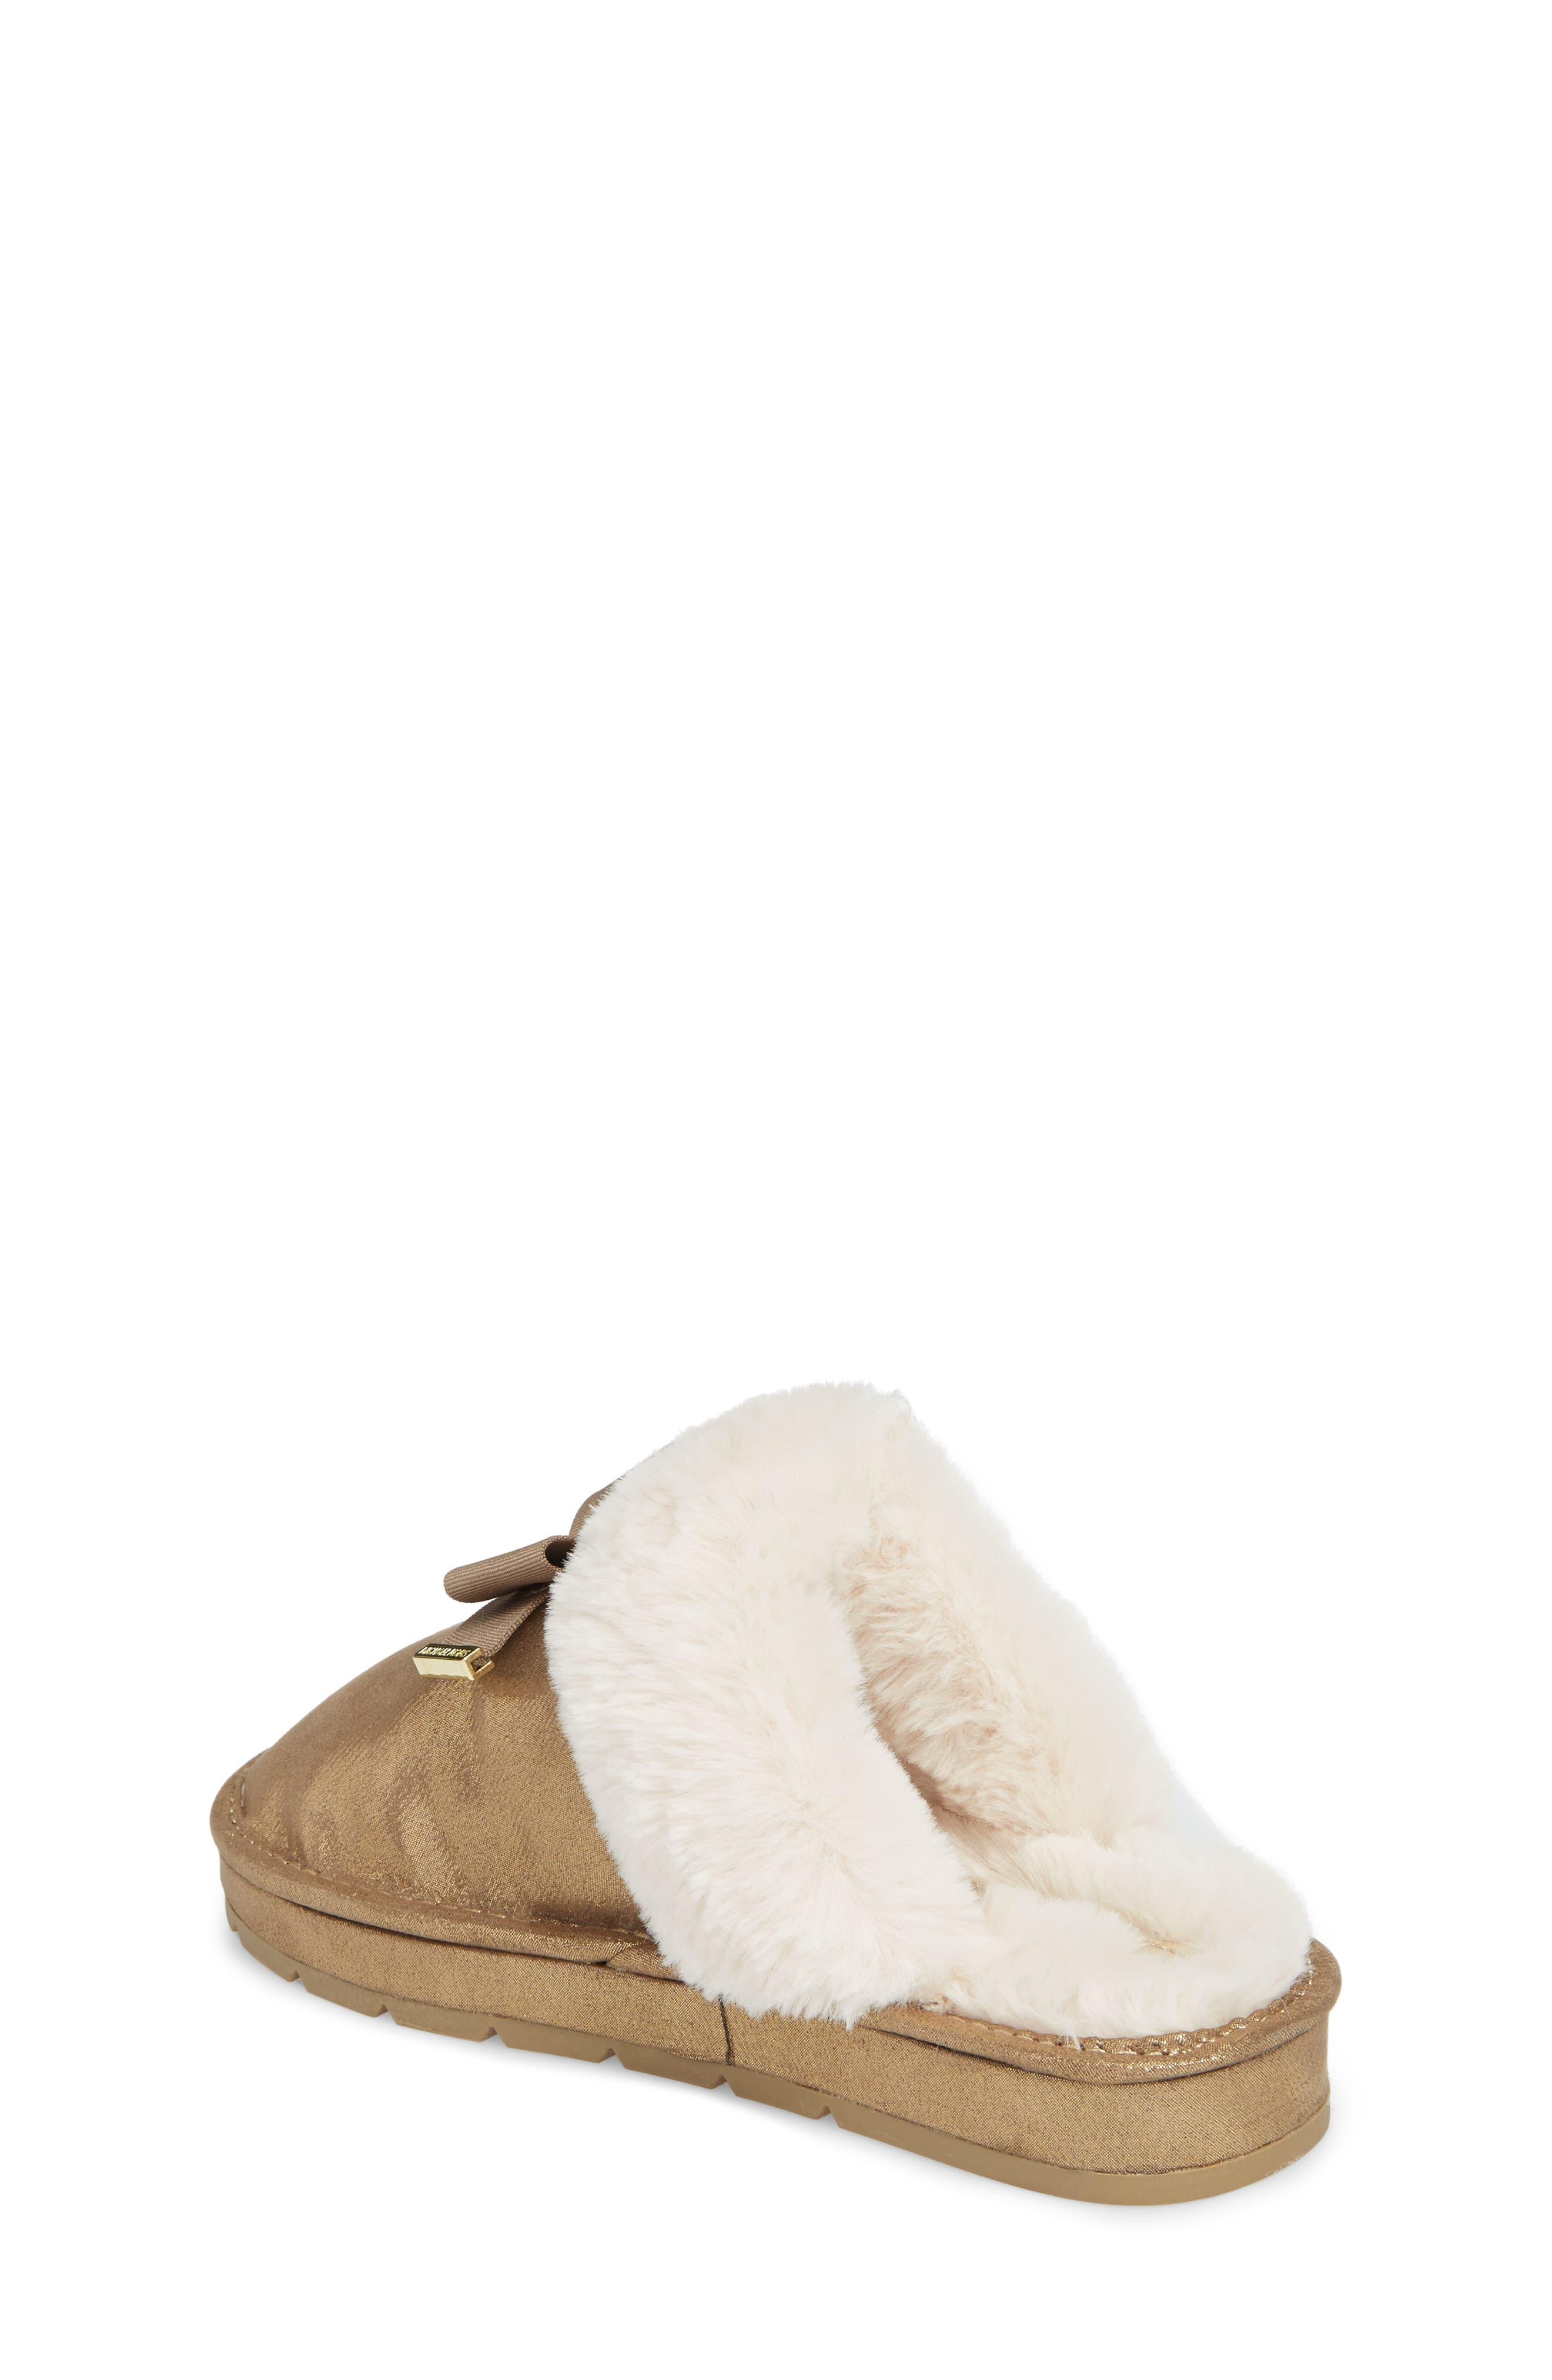 Alternate Image 2  - MICHAEL Michael Kors Grace Bow Faux Fur Lined Mule (Toddler, Little Kid & Big Kid)